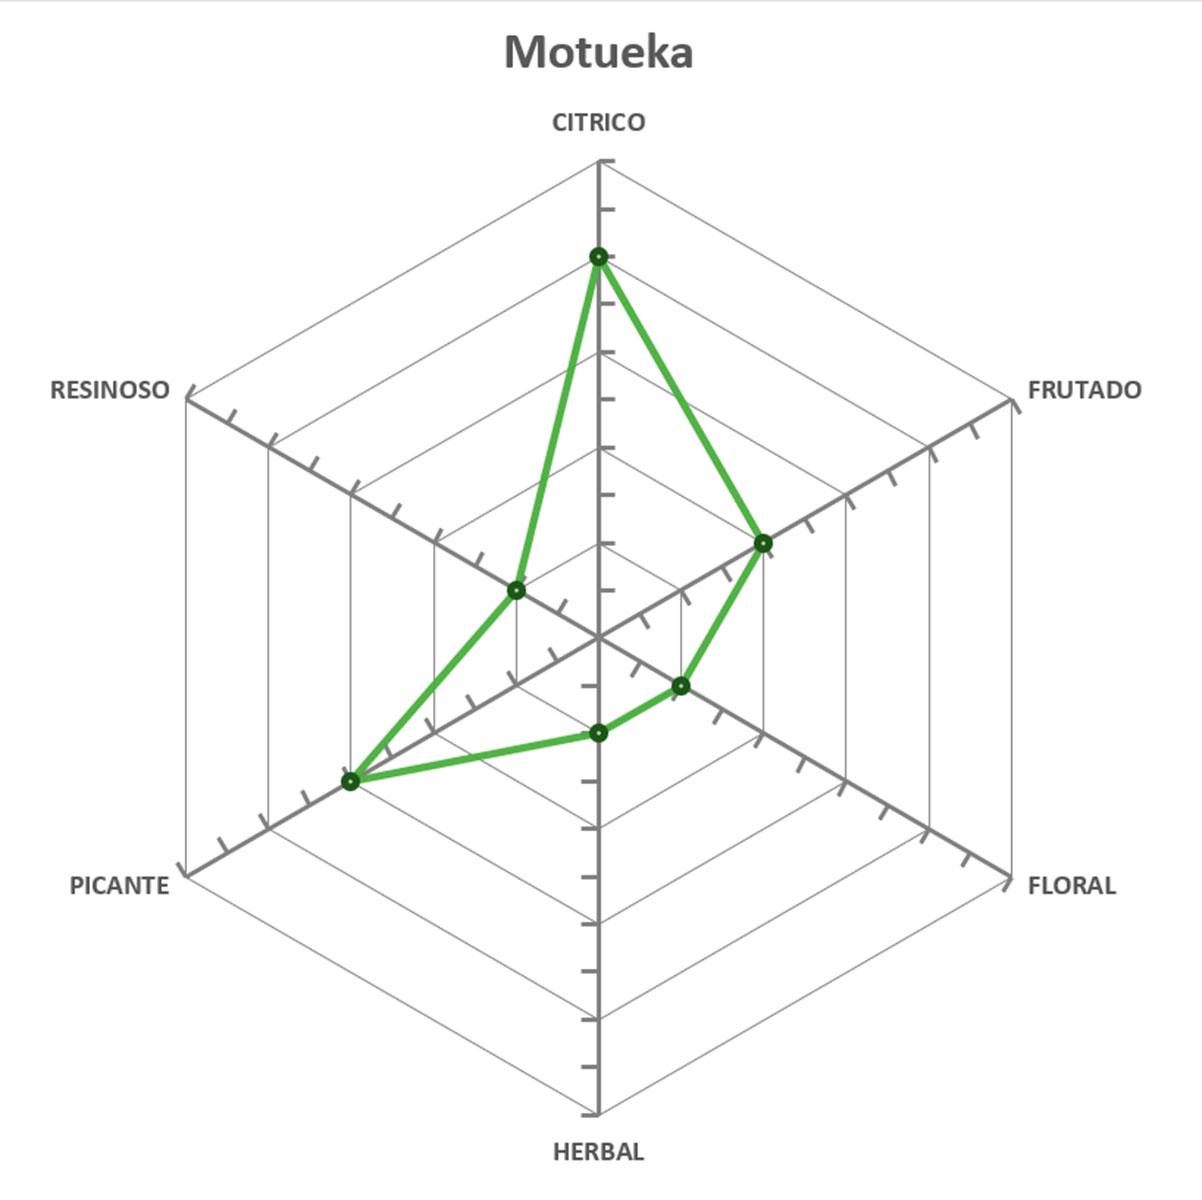 Lupulo Motueka (Barth Hass) Pellet T90 - 50g